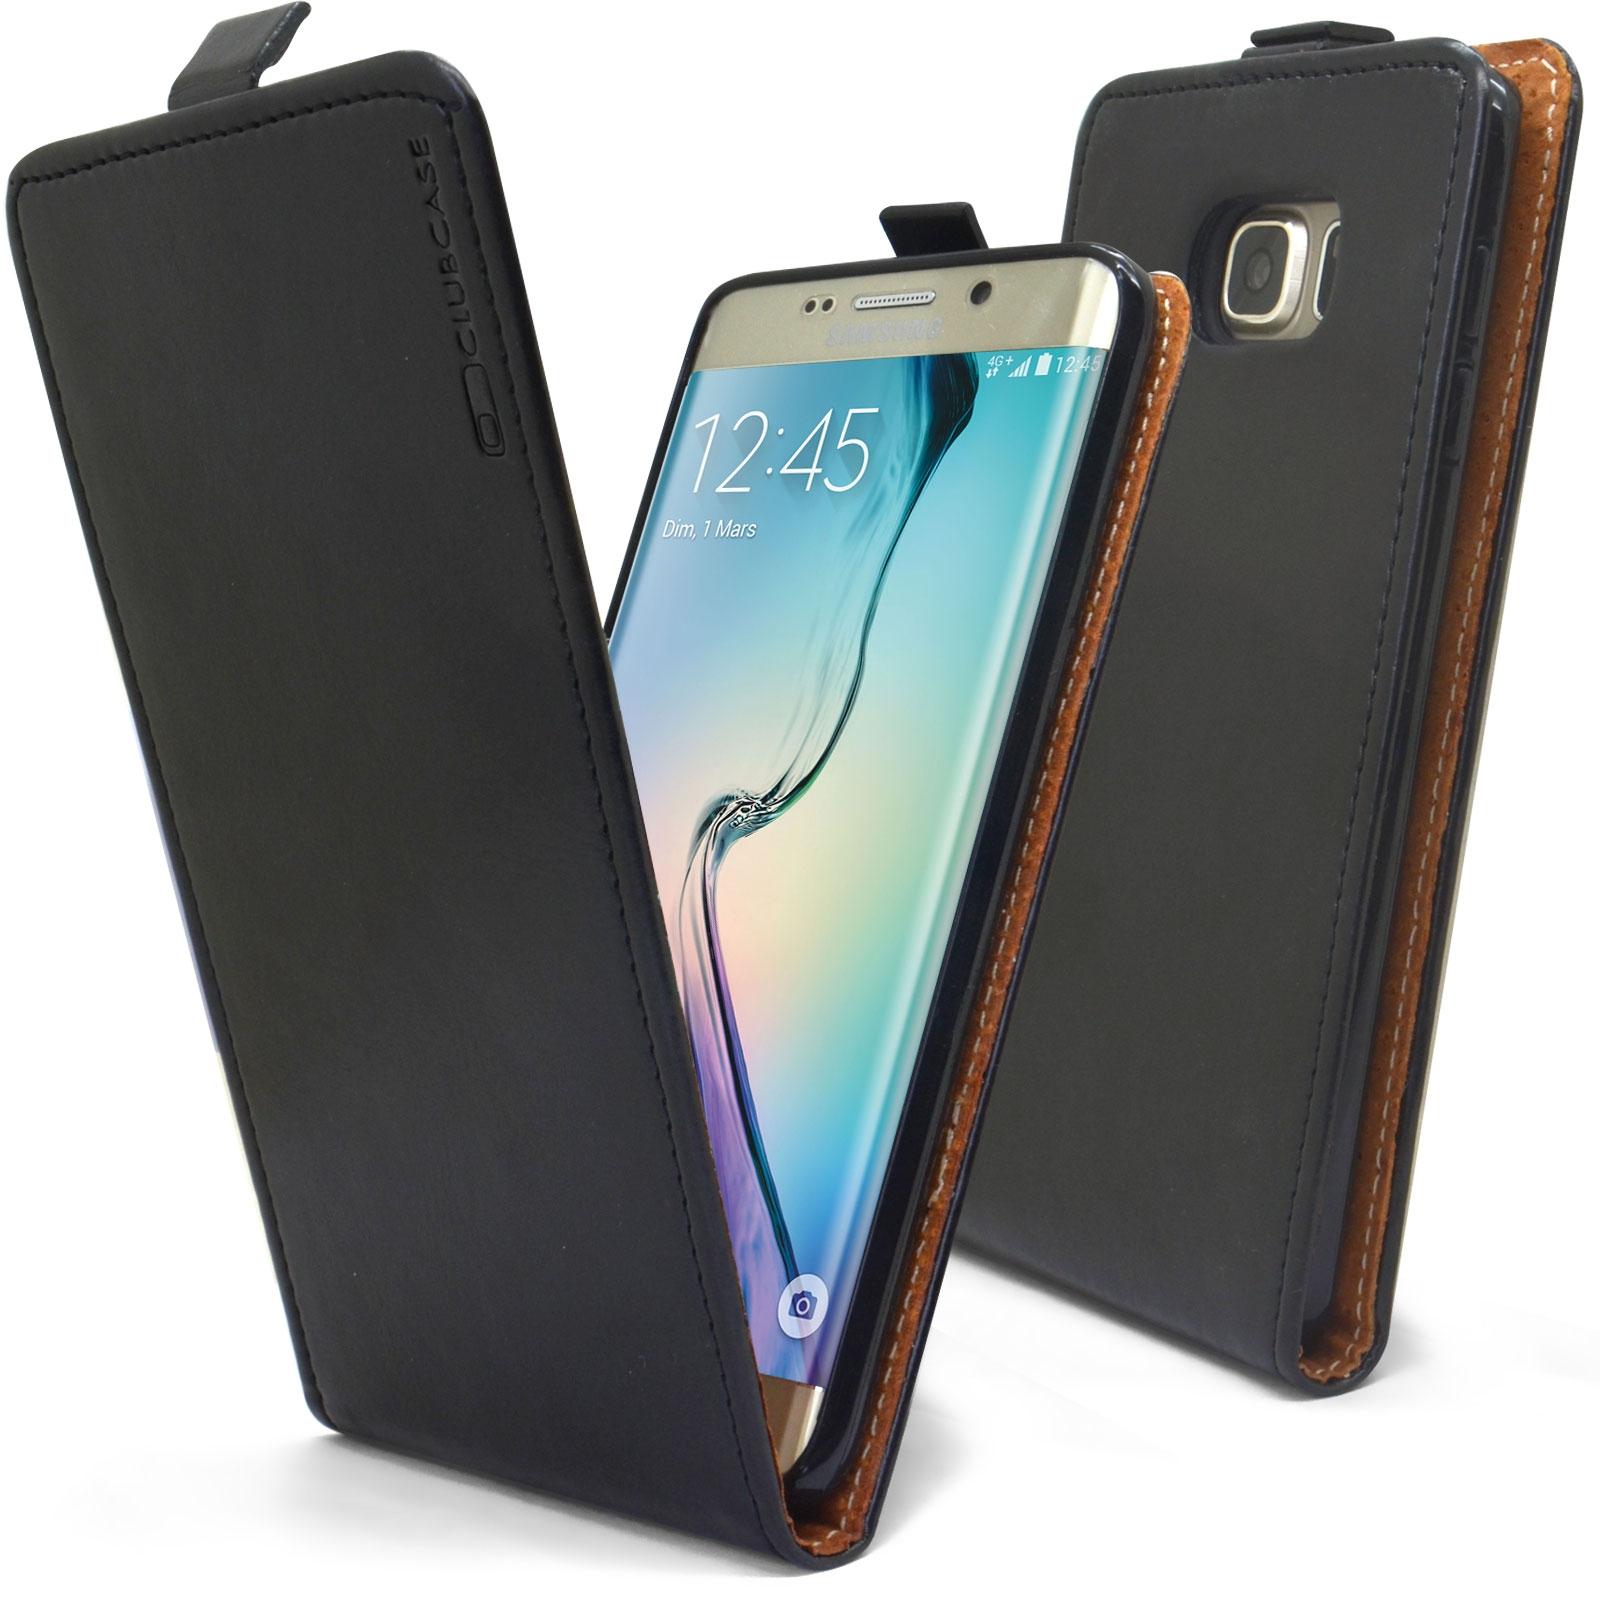 Coque Rabat Vertical Souple Samsung Galaxy S6 Edge /Plus Cuir ...